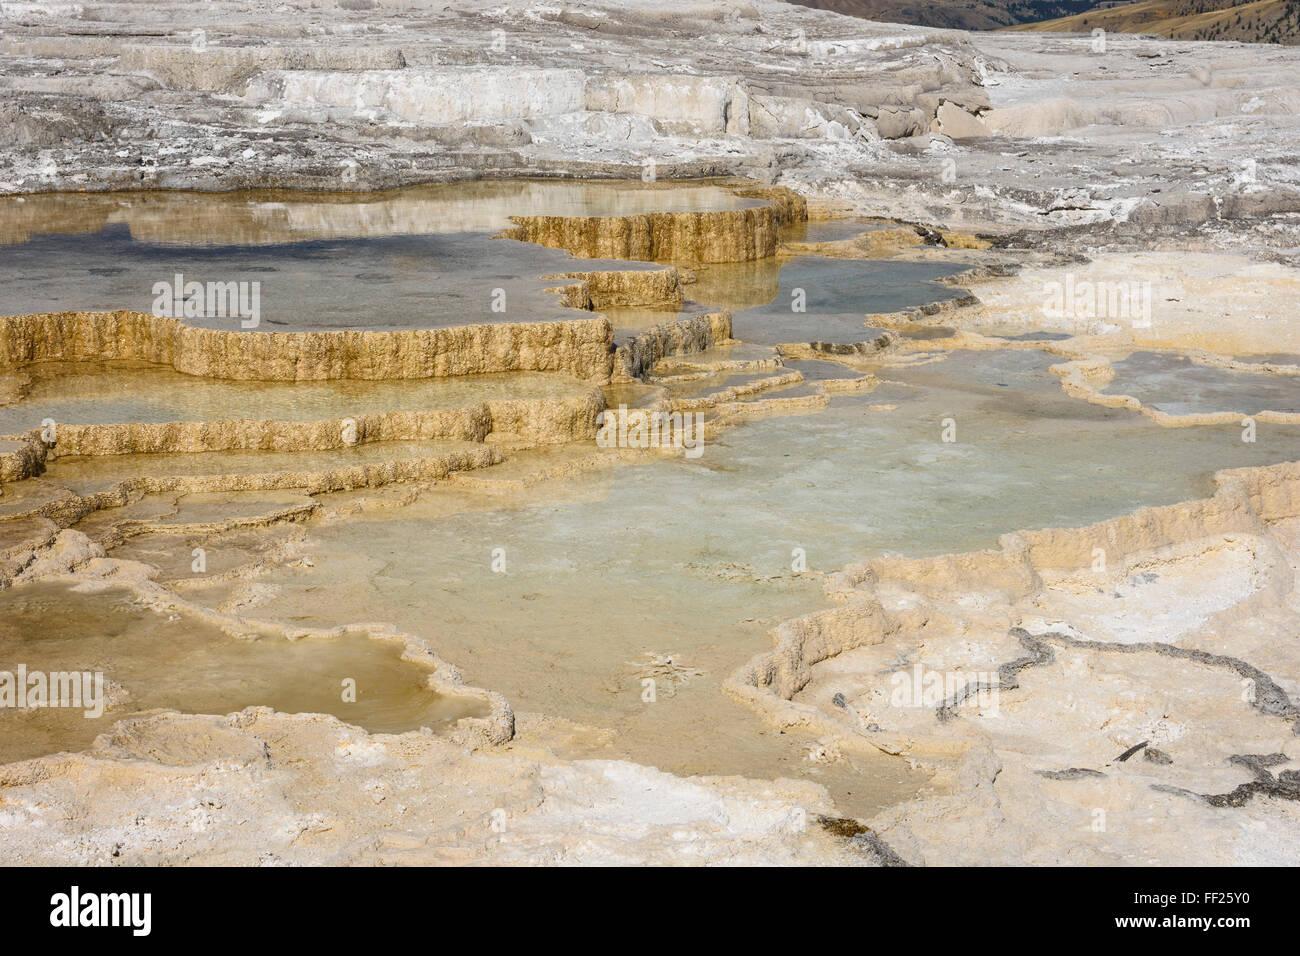 Kanarischen Frühling, Travertin Terrassen, Mammoth Hot Springs, YeRMRMowstone NationaRM Park, UNESCO, Wyoming, Stockbild